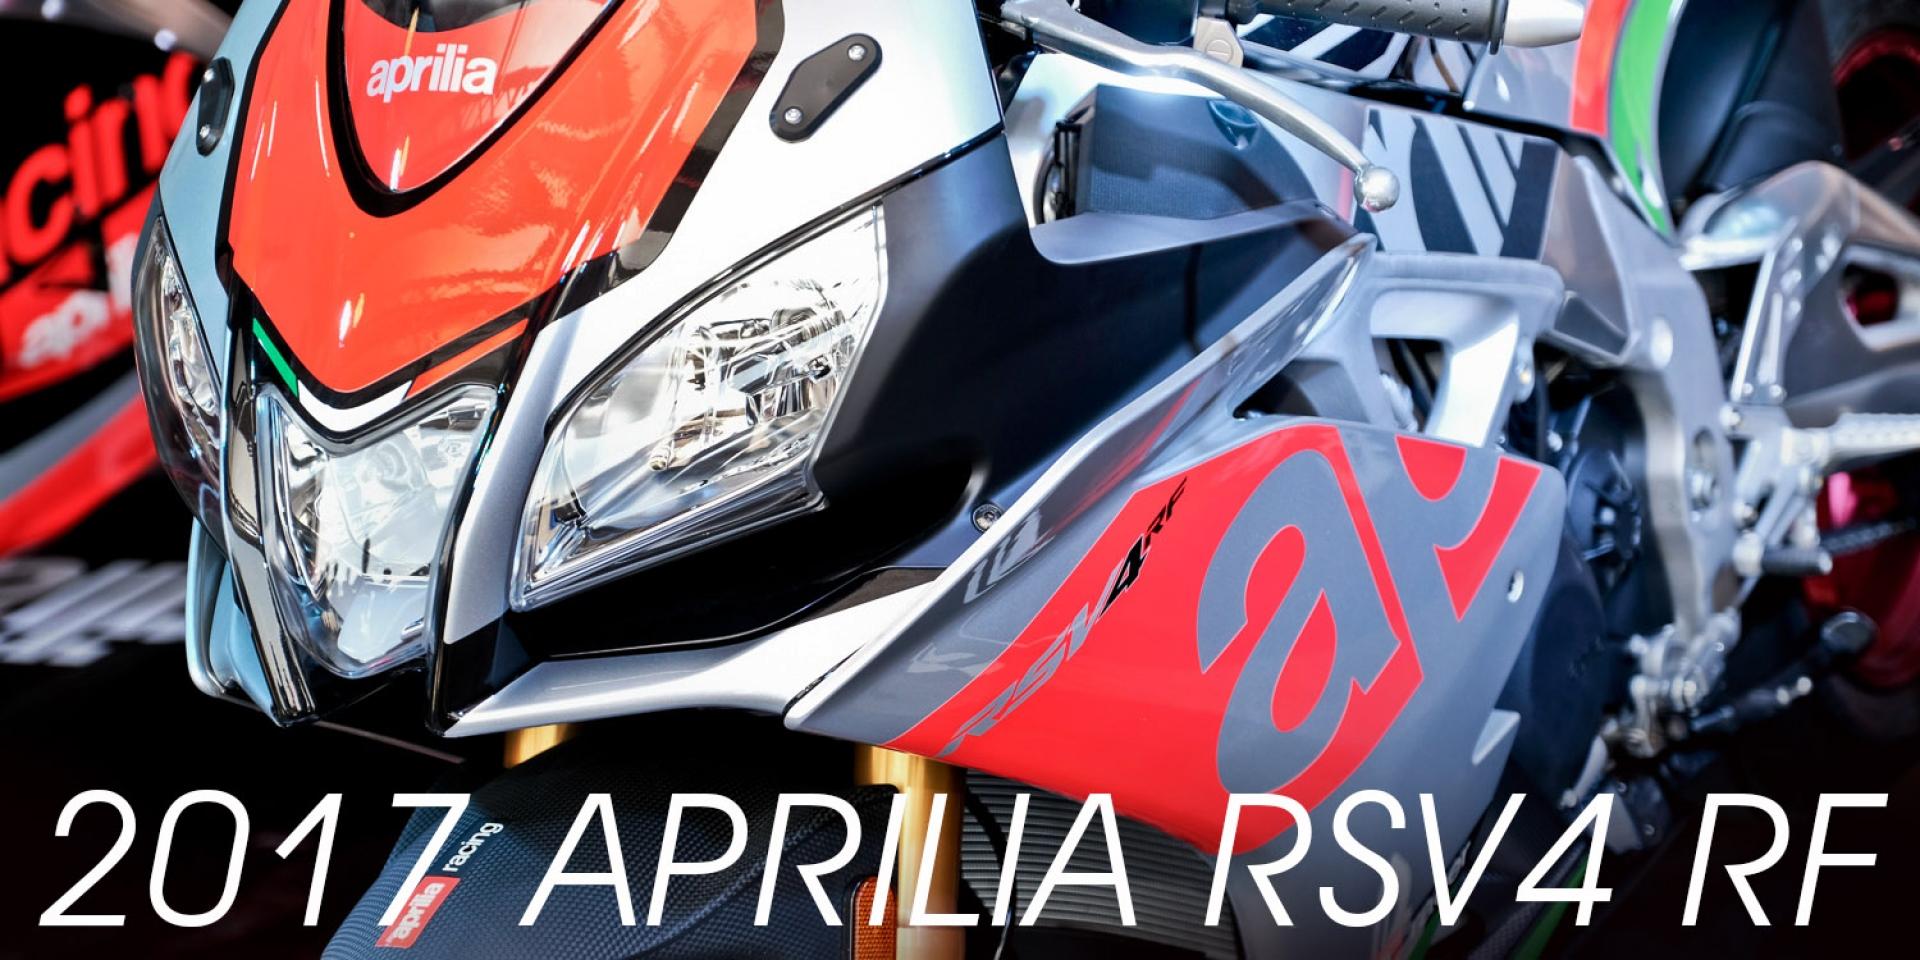 V4軍團集結。2017 Aprilia RSV4 RF 賽道日正式發表